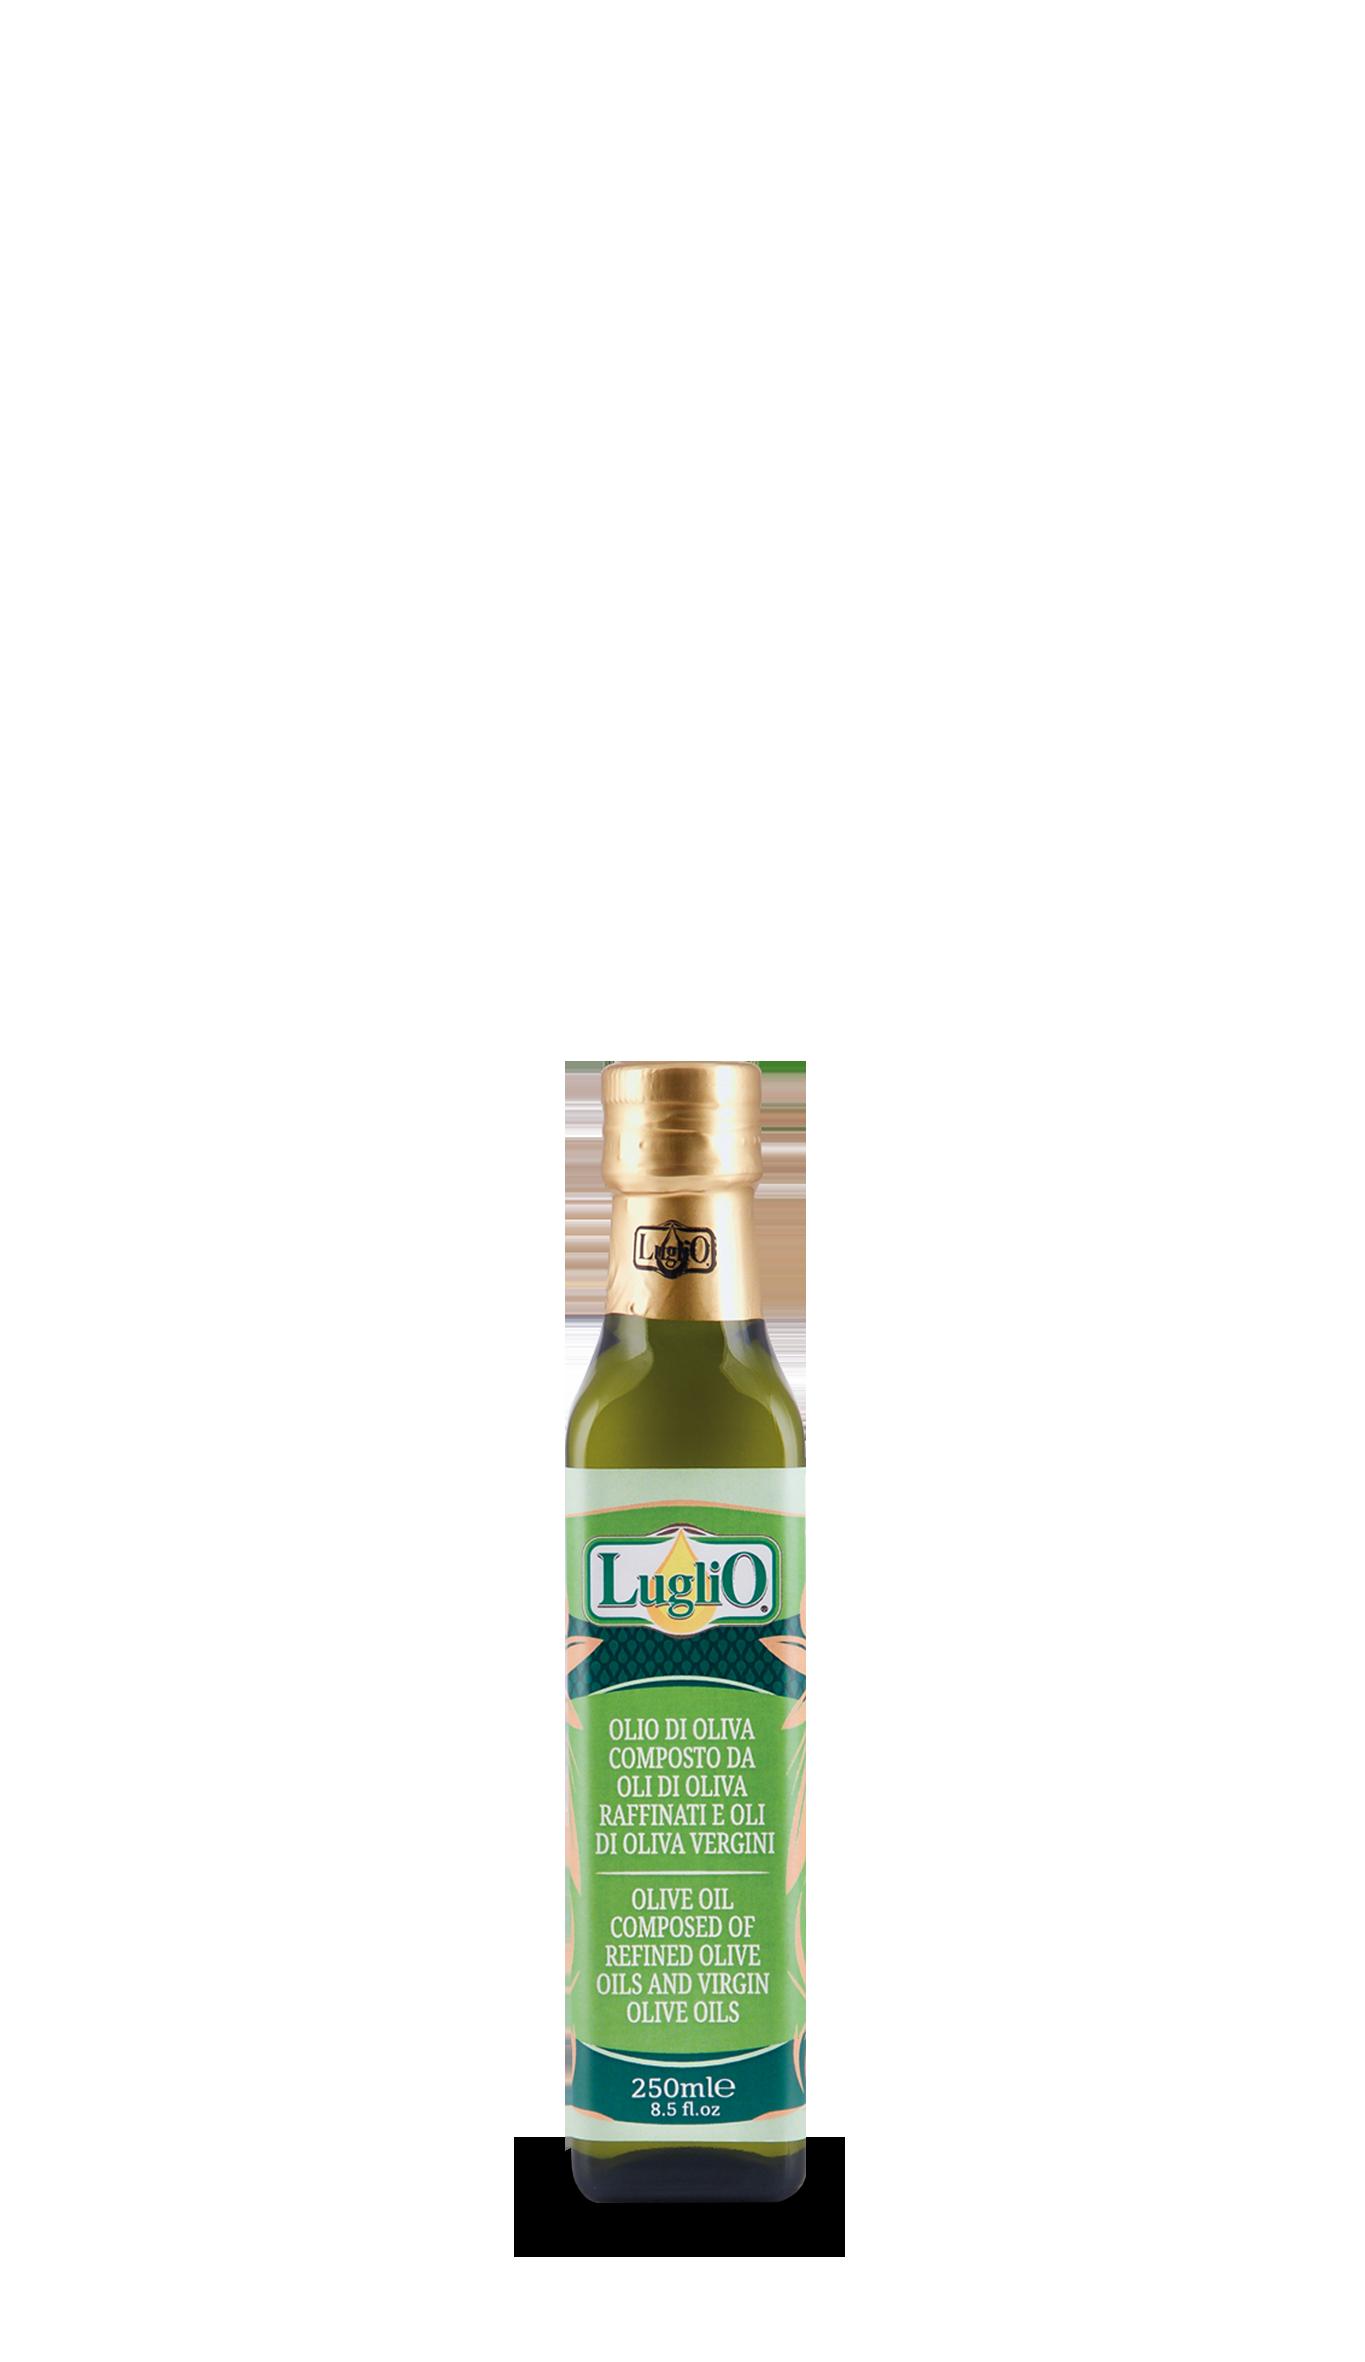 Olio Luglio olio d'oliva 250ml in bottiglia di vetro